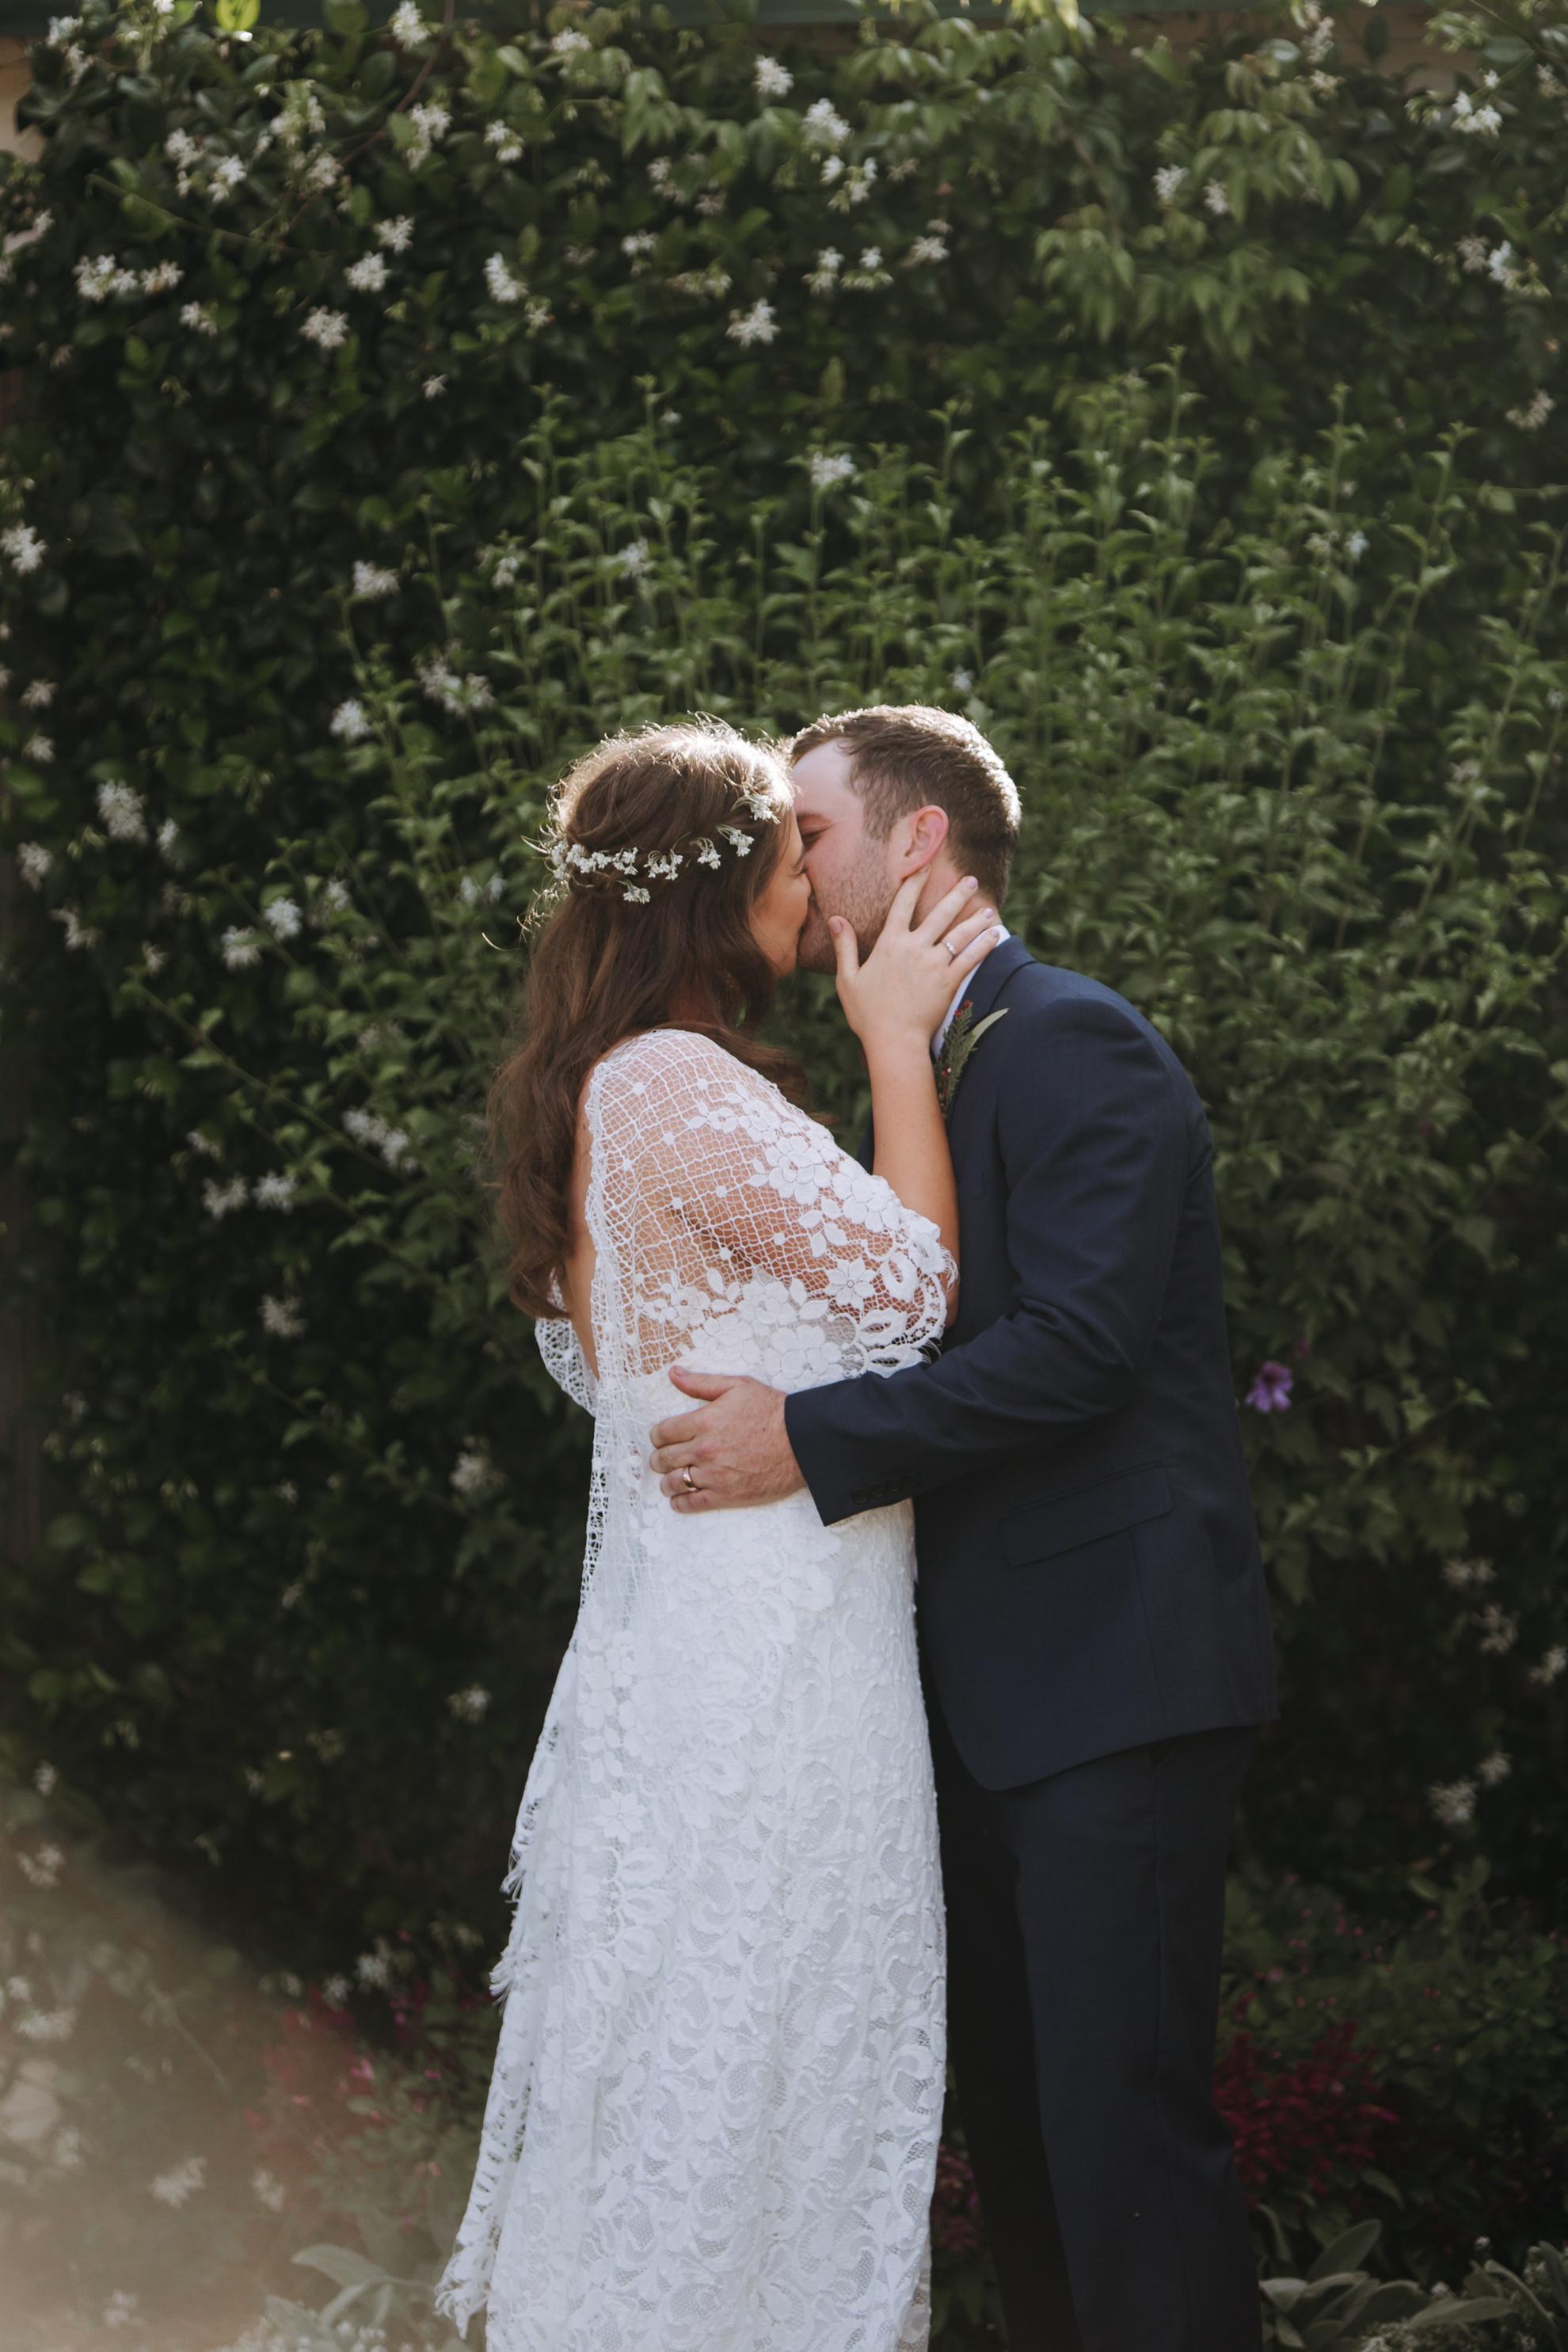 043-Jason_Jessie_Dalby_Country_Wedding.jpg